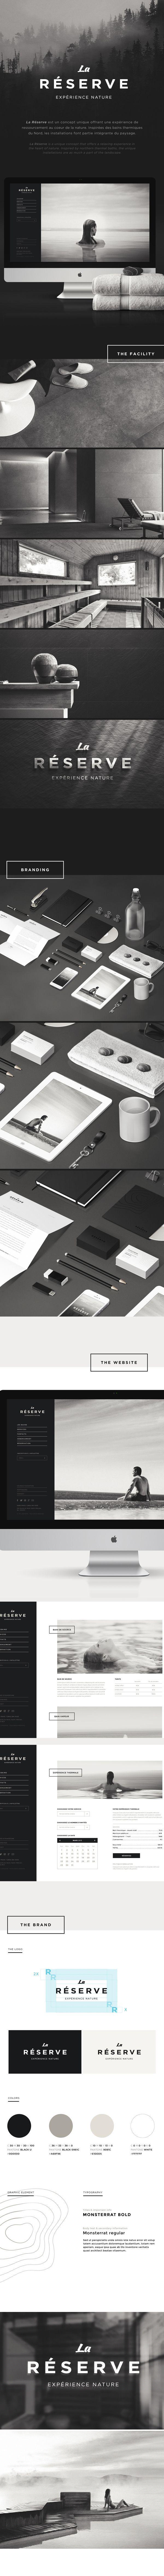 La Reserve, Property, Monotone, Branding, Website